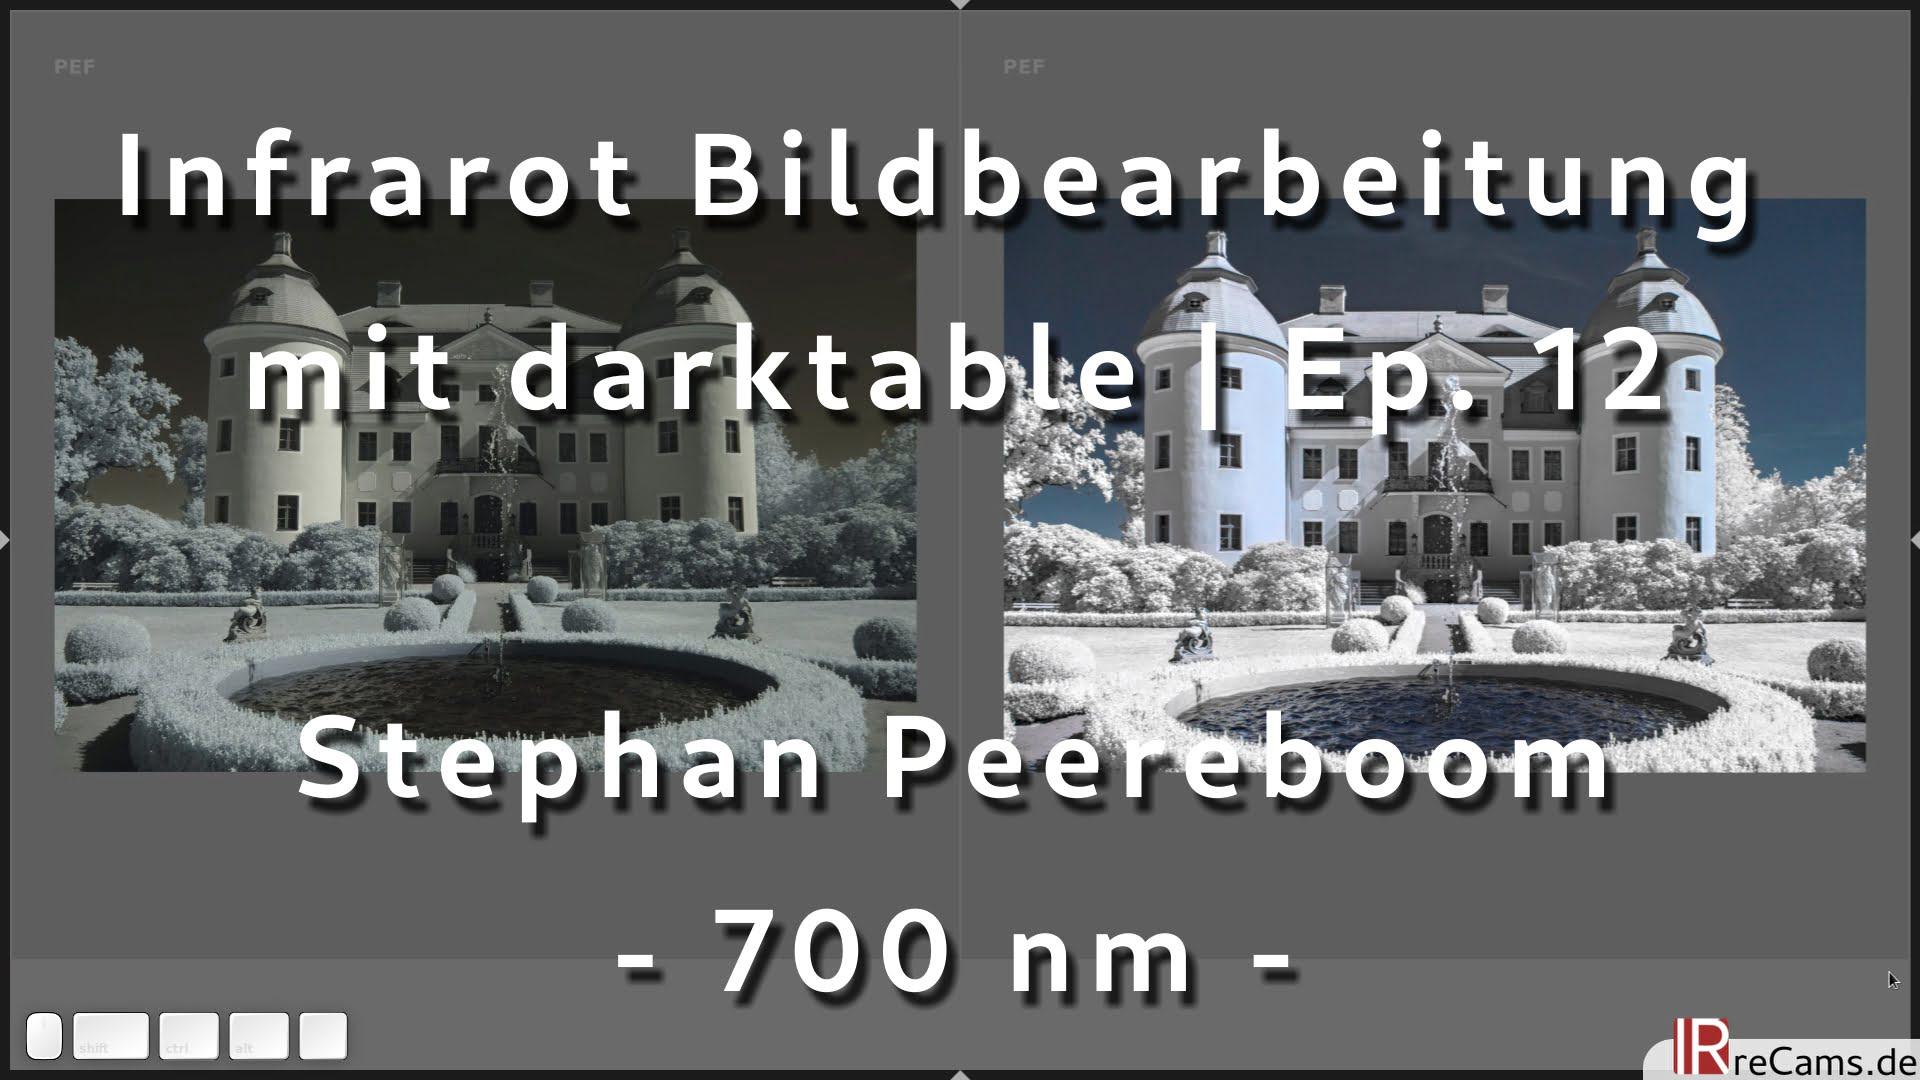 Infrarot Bildbearbeitung mit Darktable Episoede 7 - 700 nm